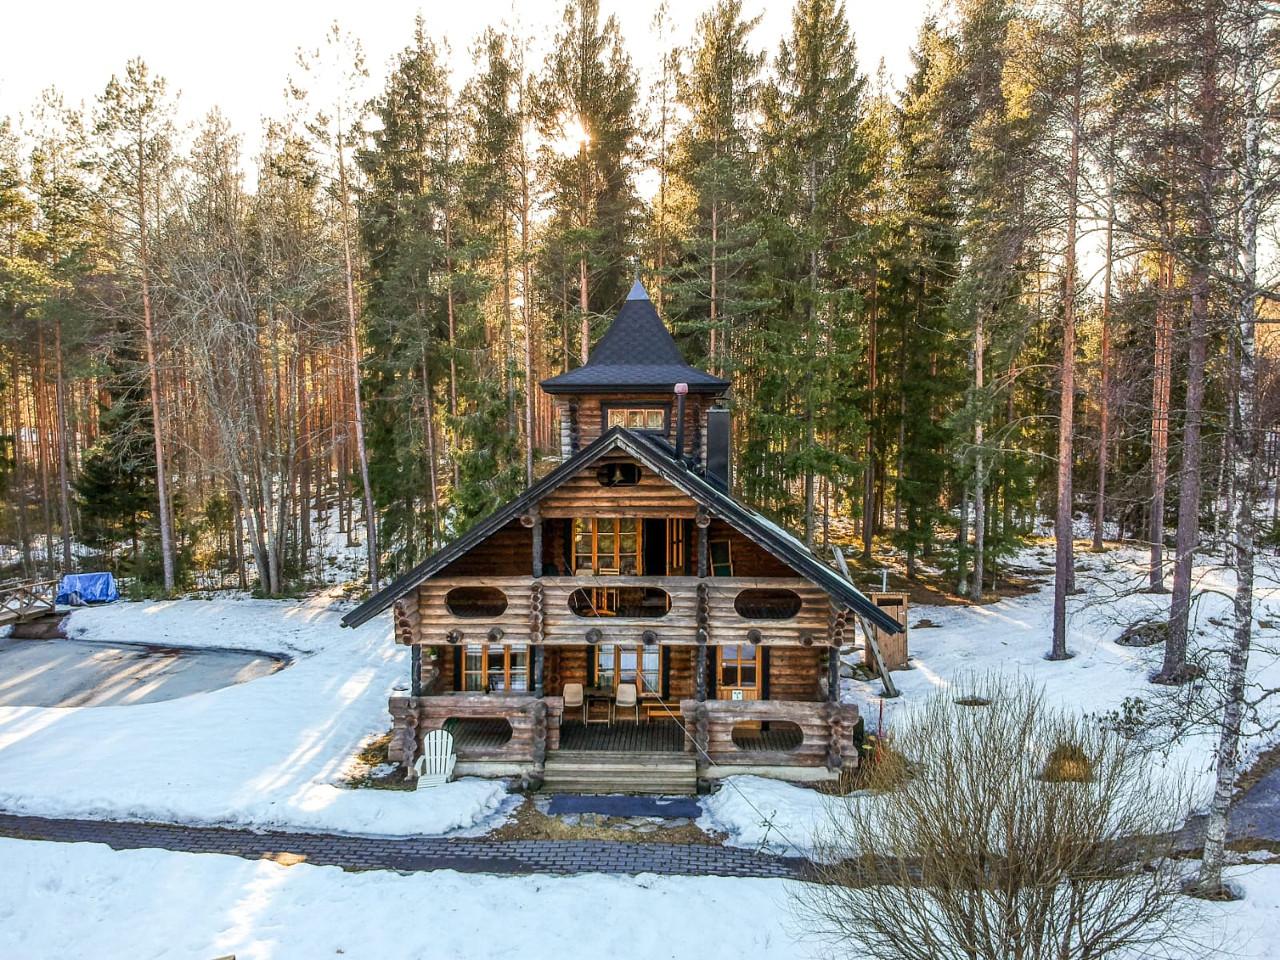 Villa Irene cottage in winter